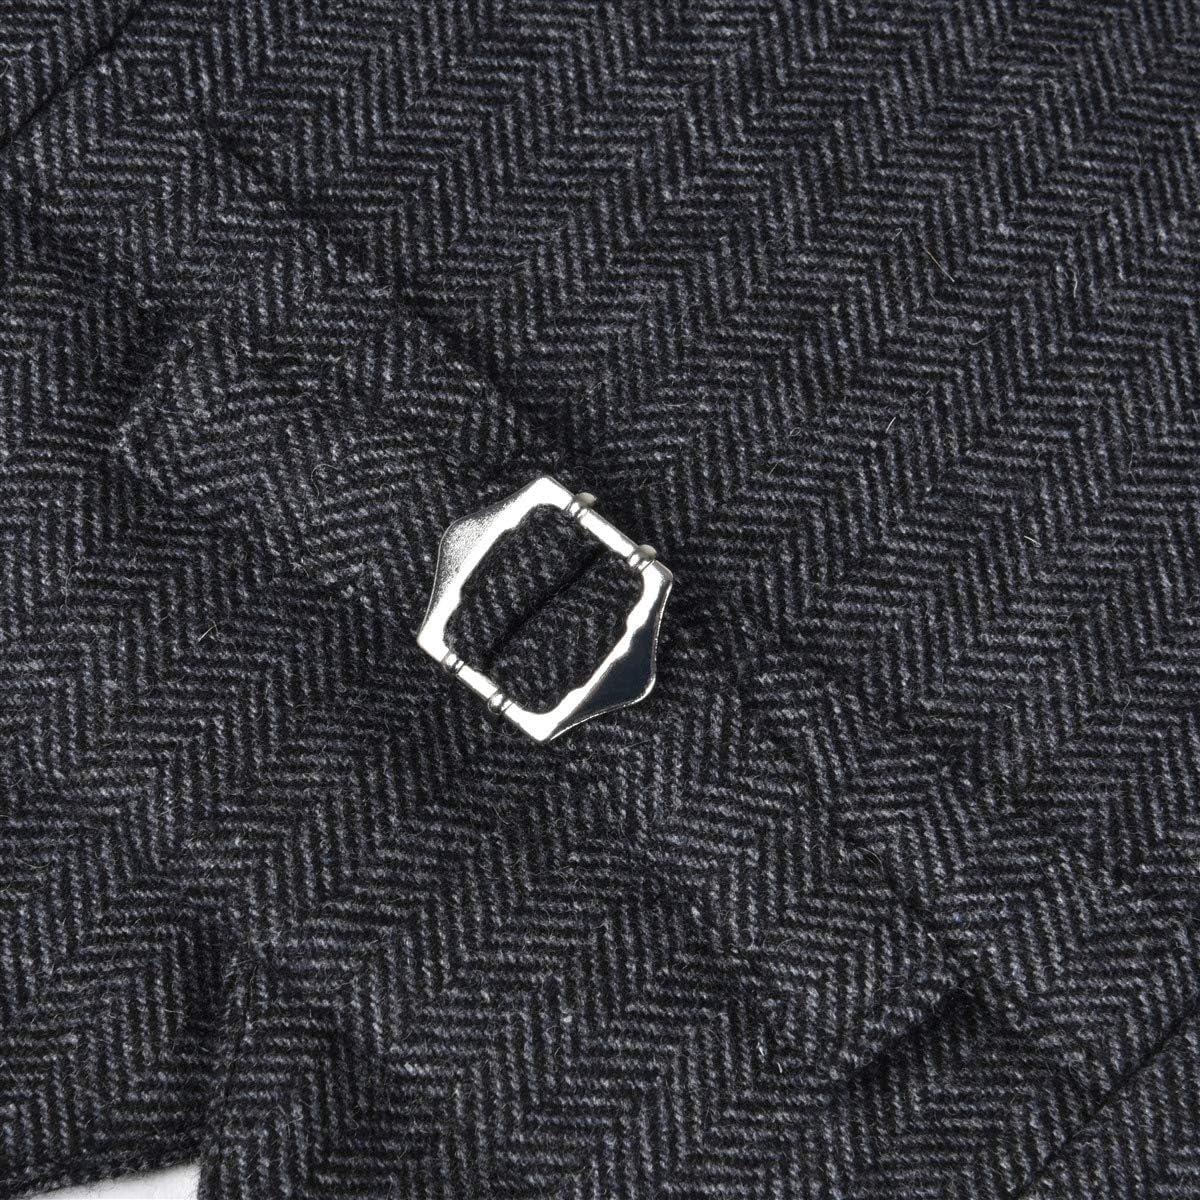 JANGOUL Boys Premium Wool Blend Suits Vest Toddler Child Herringbone Tweed Waistcoat